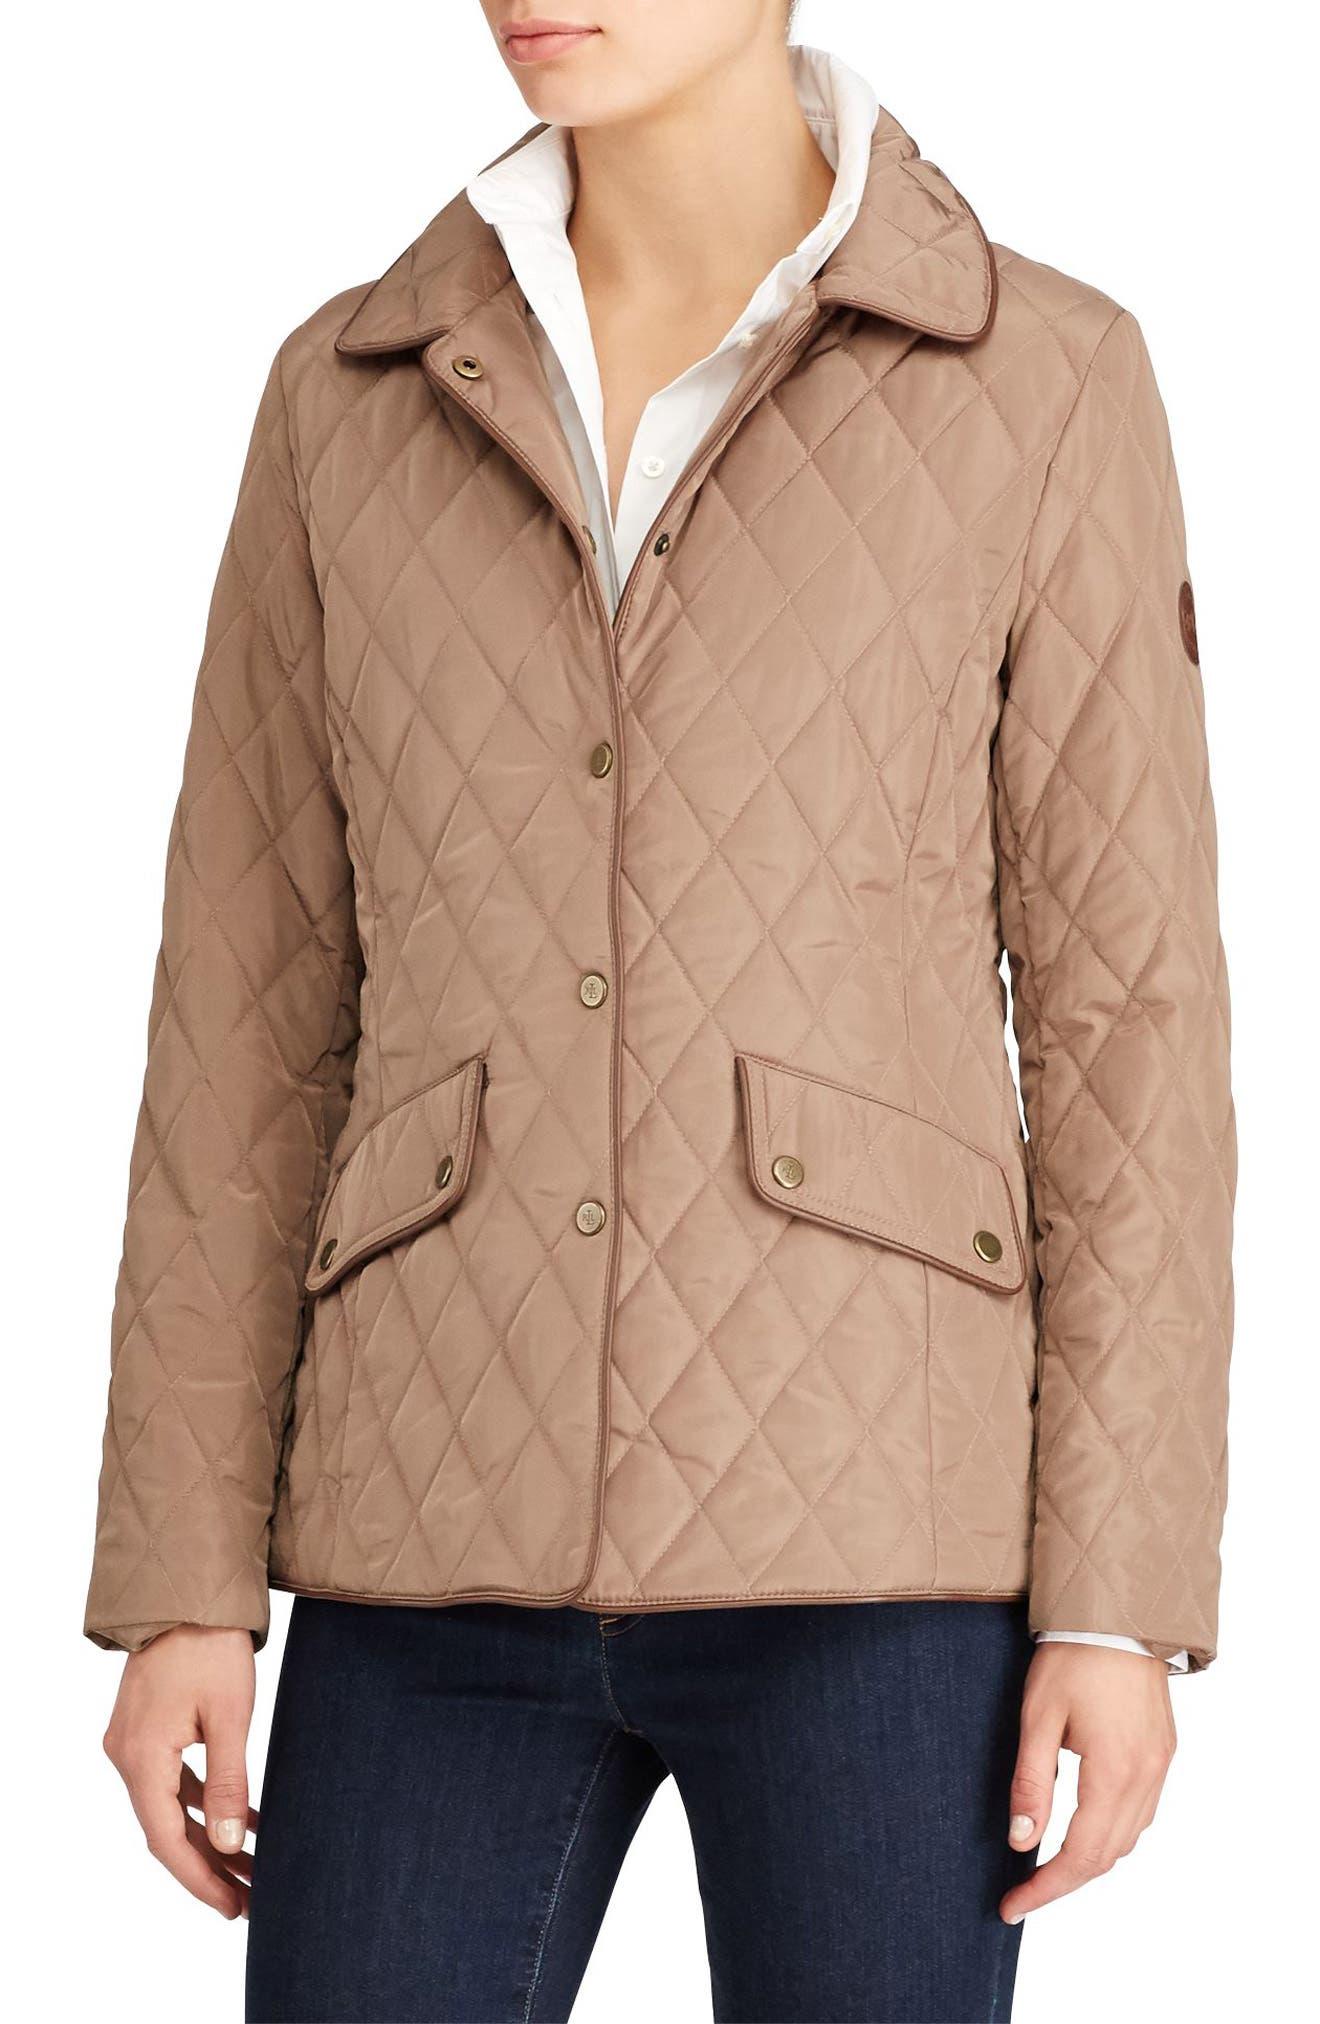 Main Image - Lauren Ralph Lauren Faux Leather Trim Quilted Jacket (Regular & Petite)